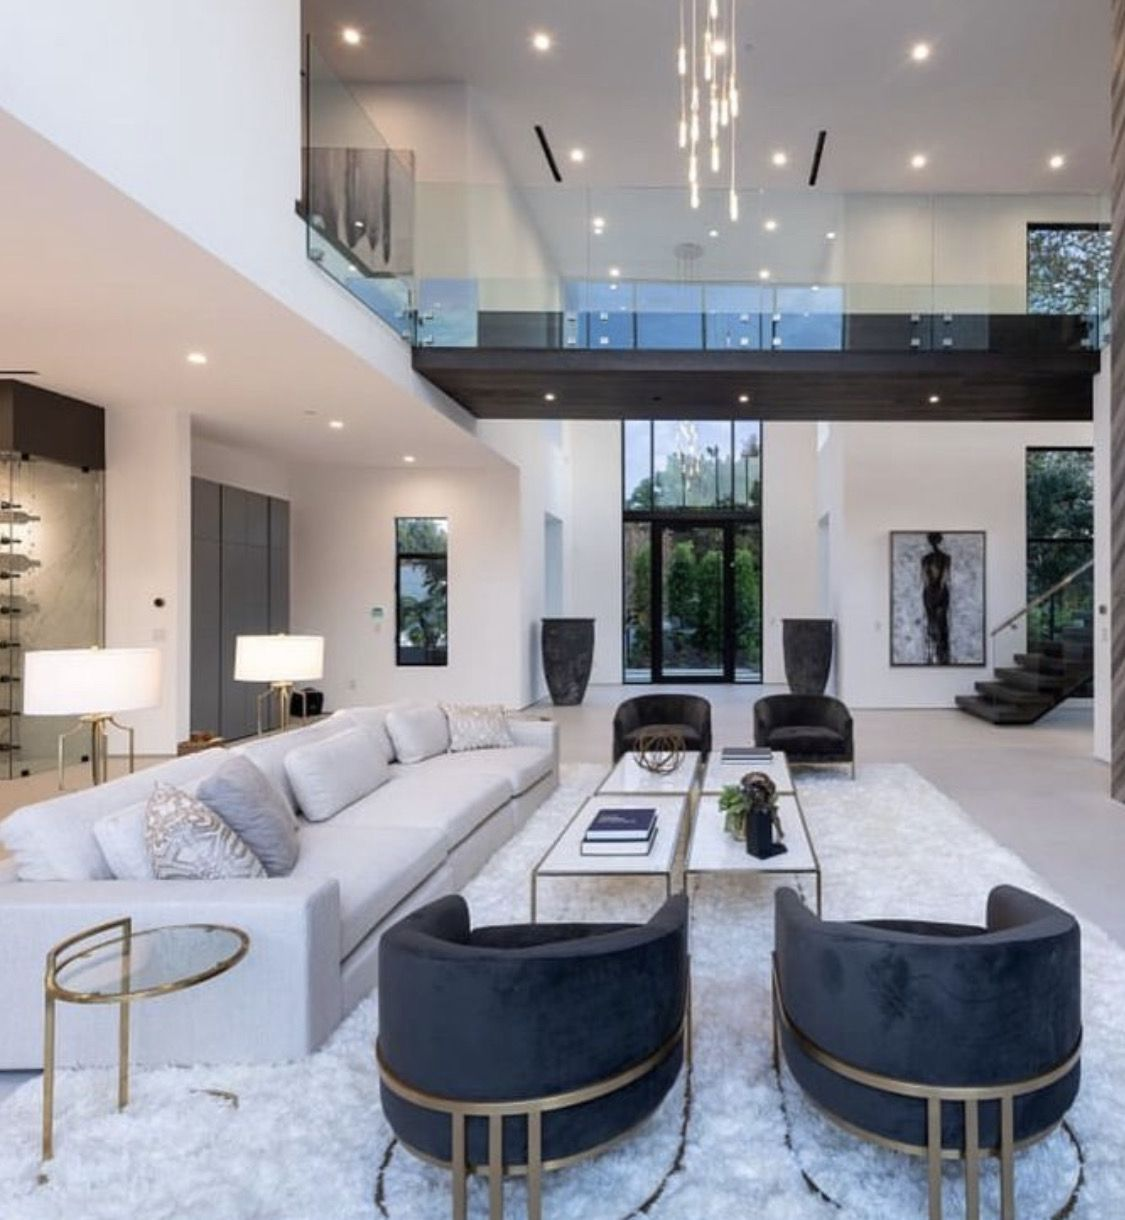 Business Marriage Sample Dream House Interior Luxury Living Room Design Luxury Living Room House designs living room